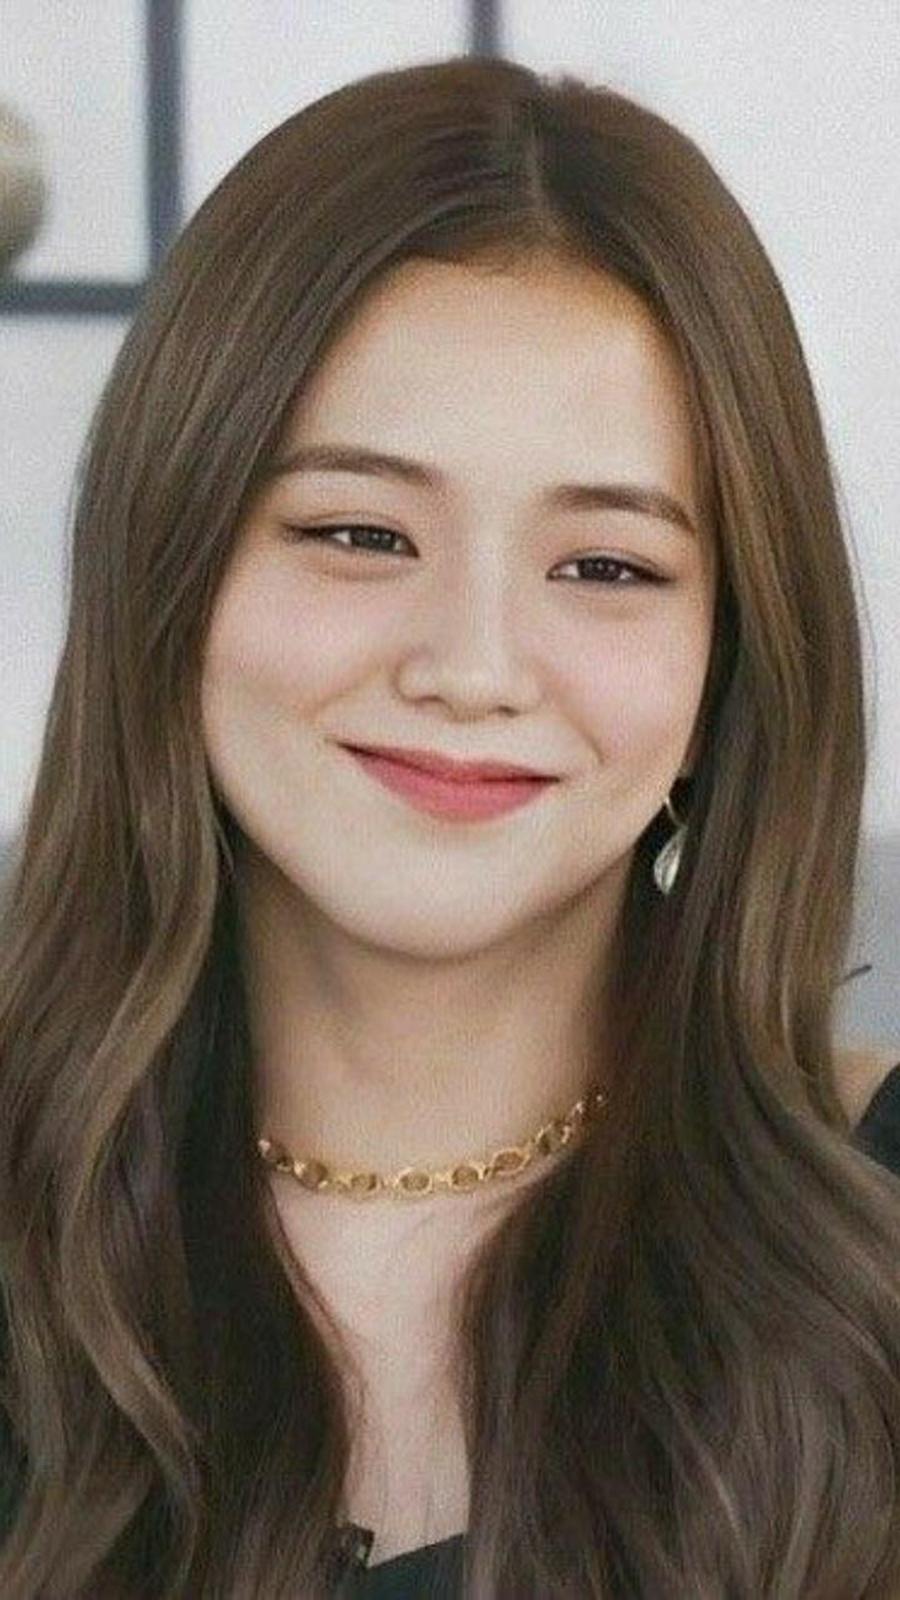 Blackpink Girl Smile Wallpapers Download For Mobile